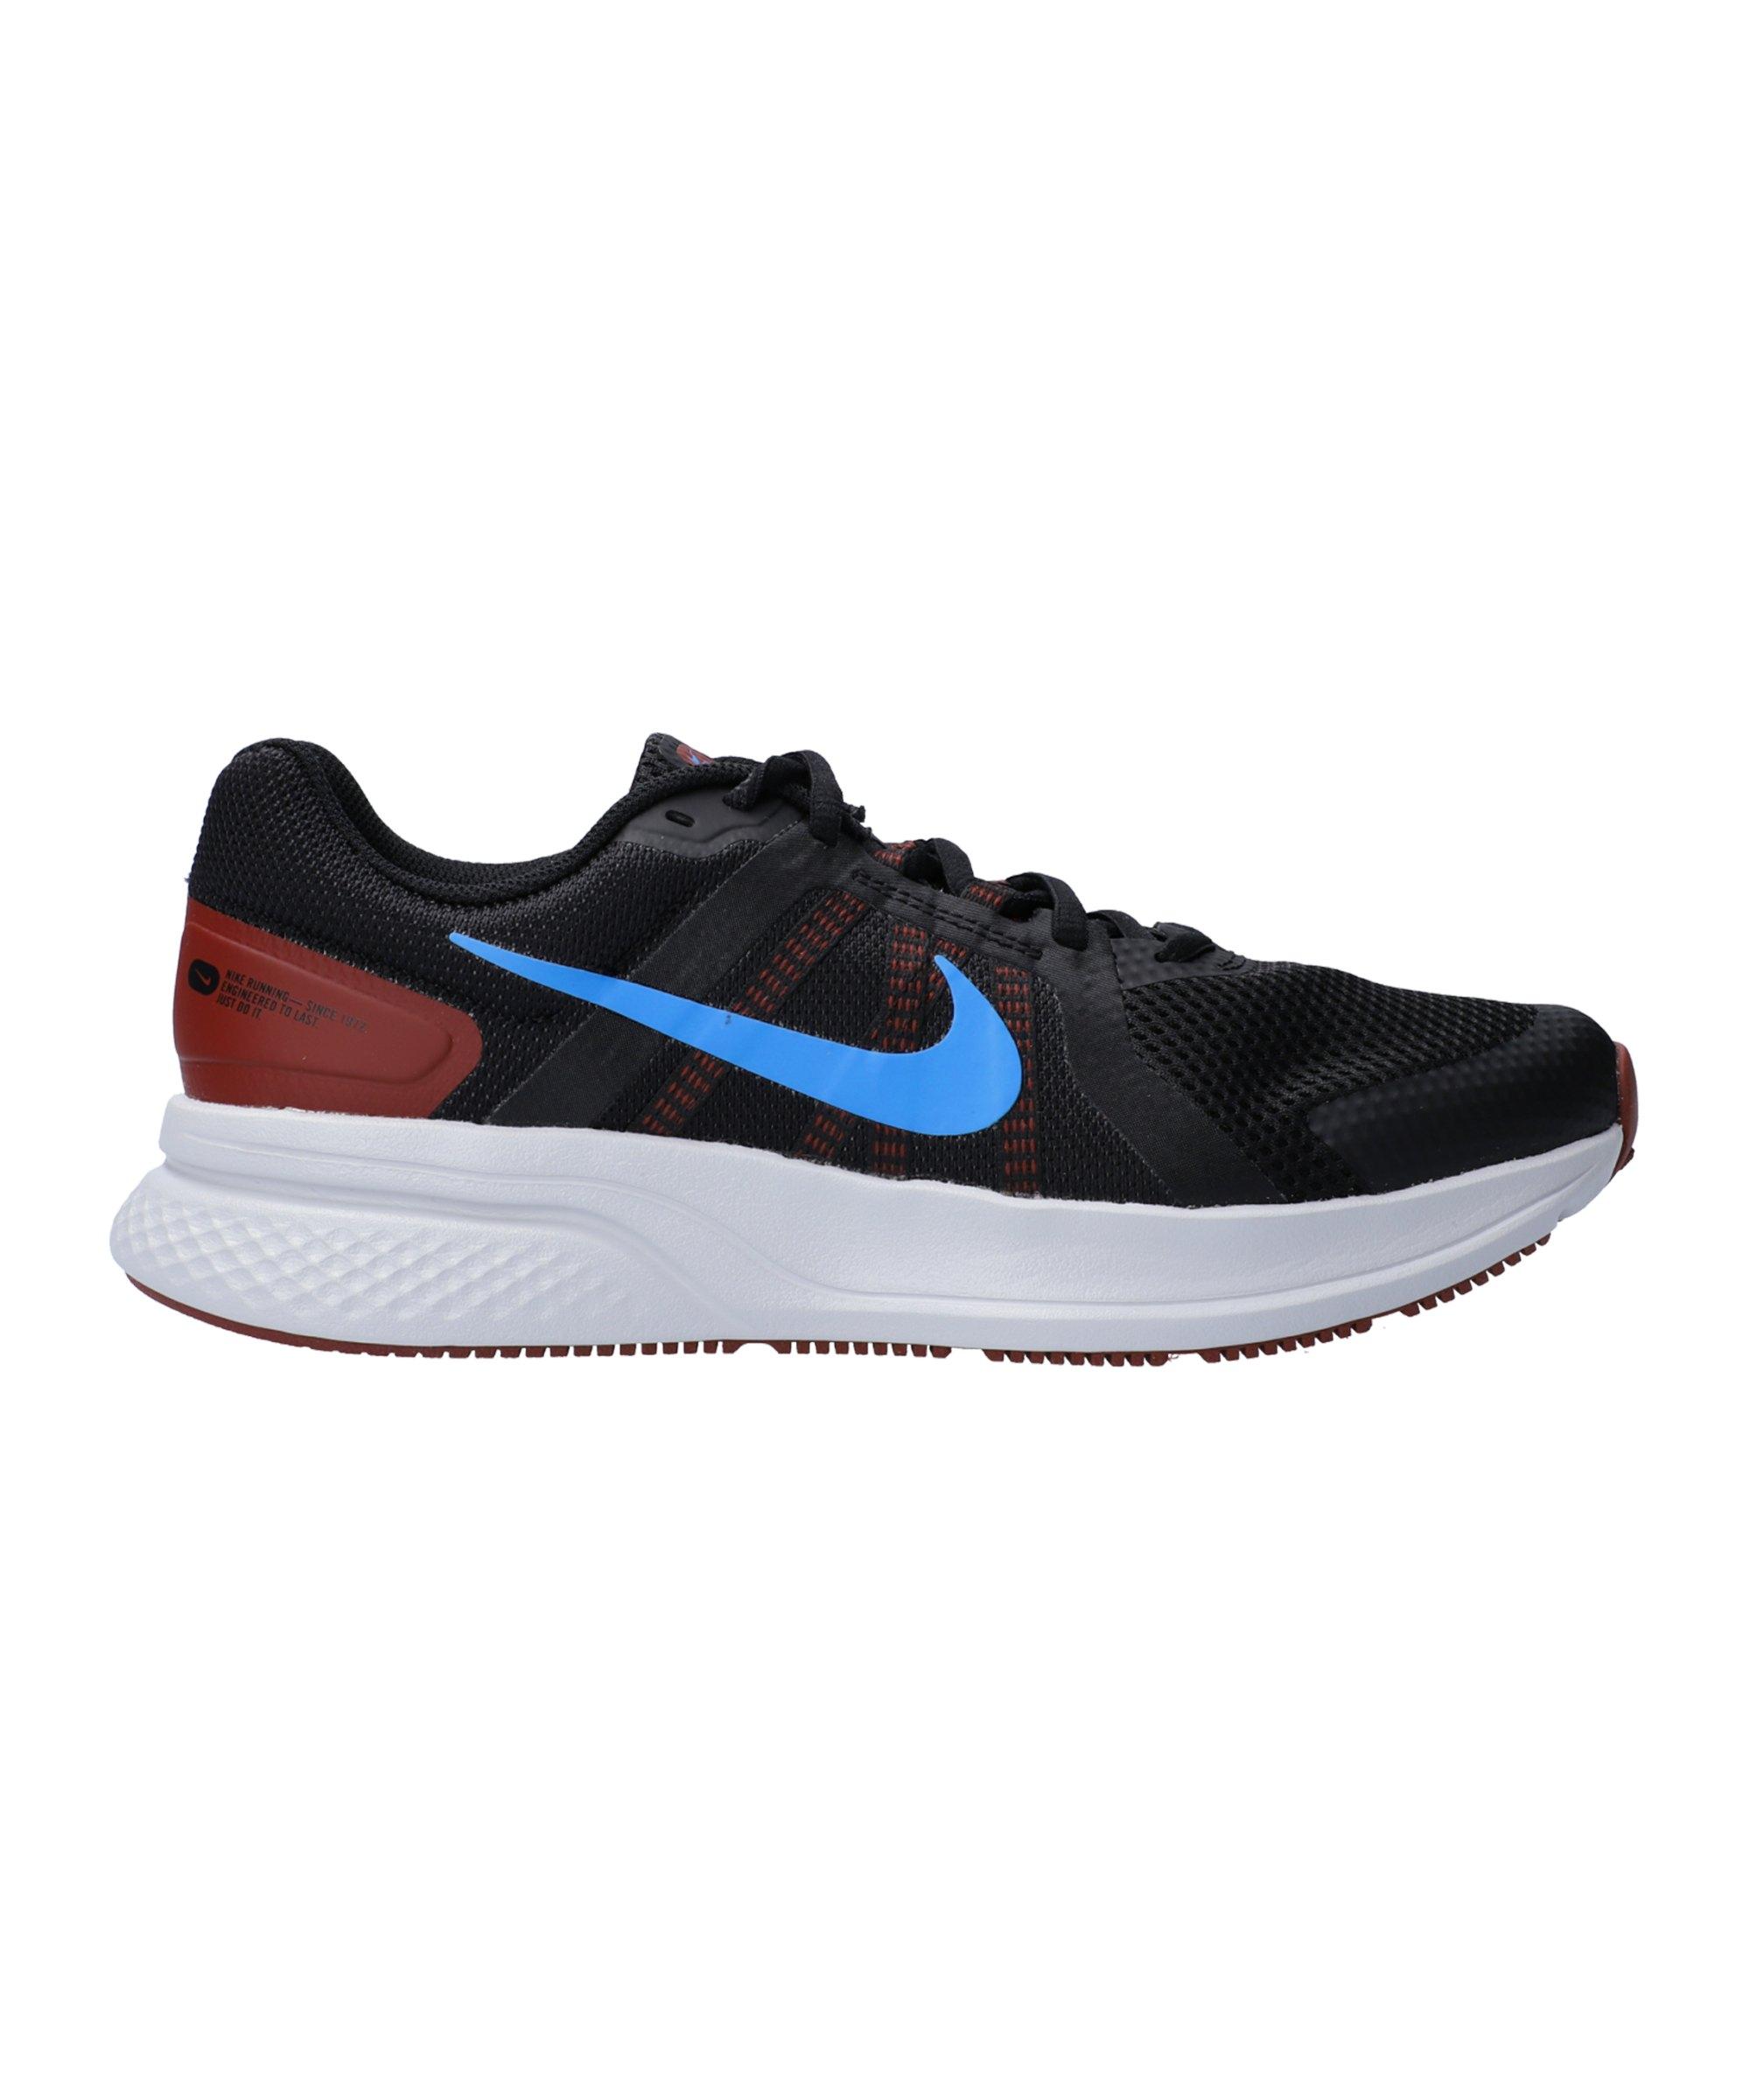 Nike Run Swift 2 Running Schwarz Blau F001 - schwarz